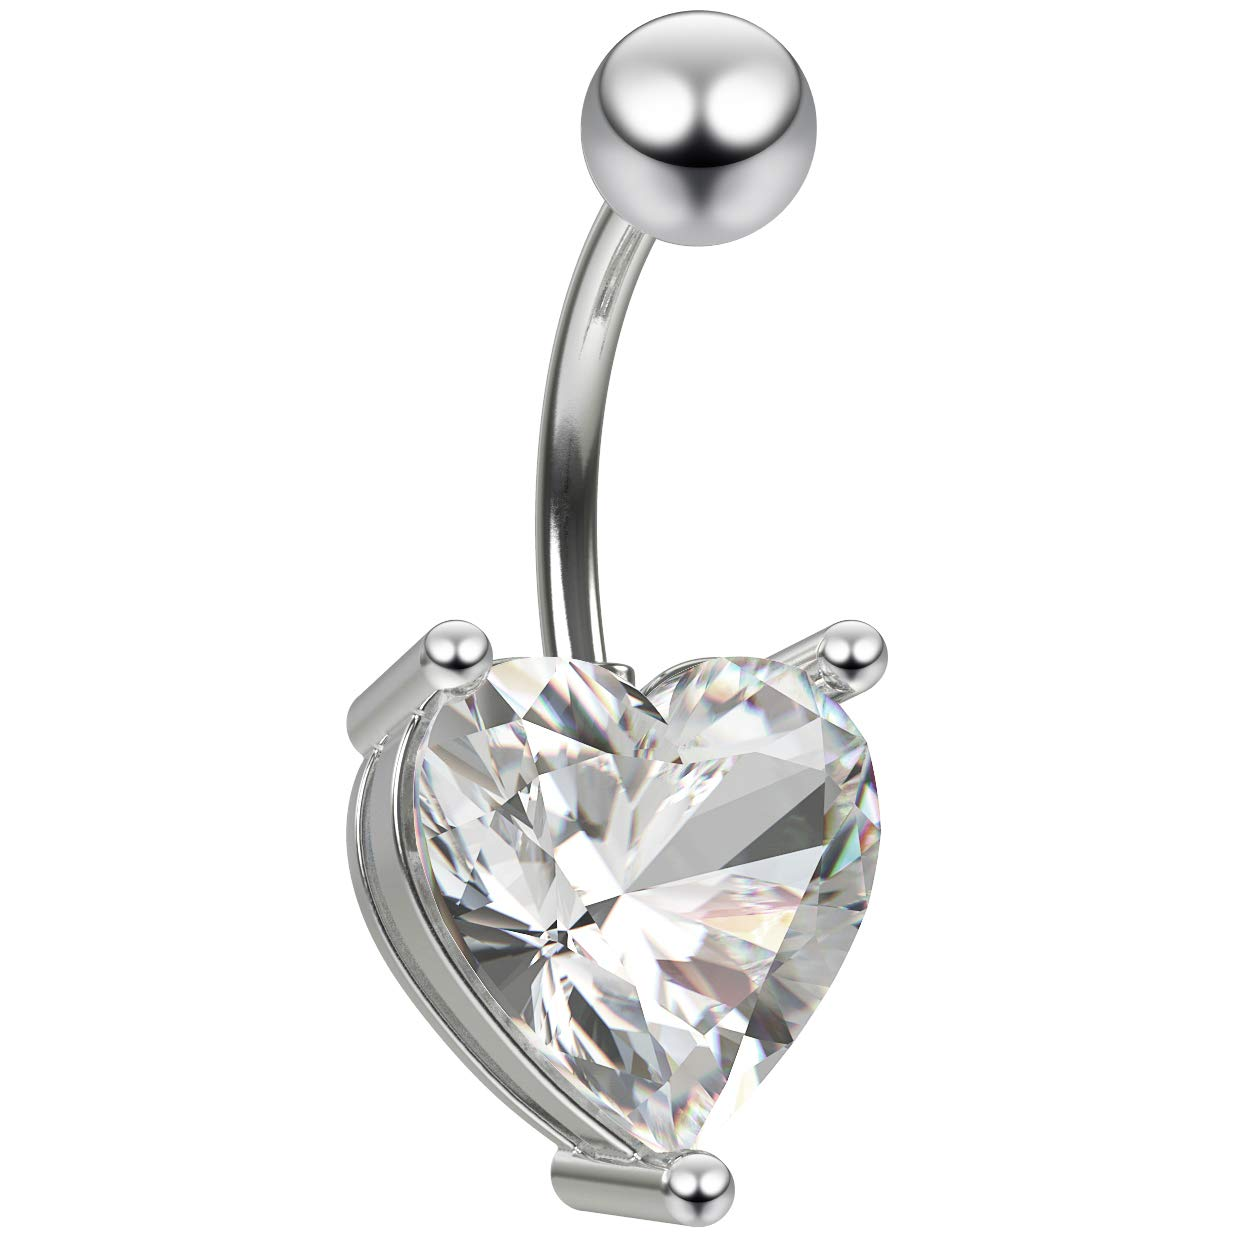 Bling Piercing 14g Belly Button Crystal Cubic Zirconia Swarovski Cz Gauge Heart Jewel Ring Set 10mm Stainless Steel